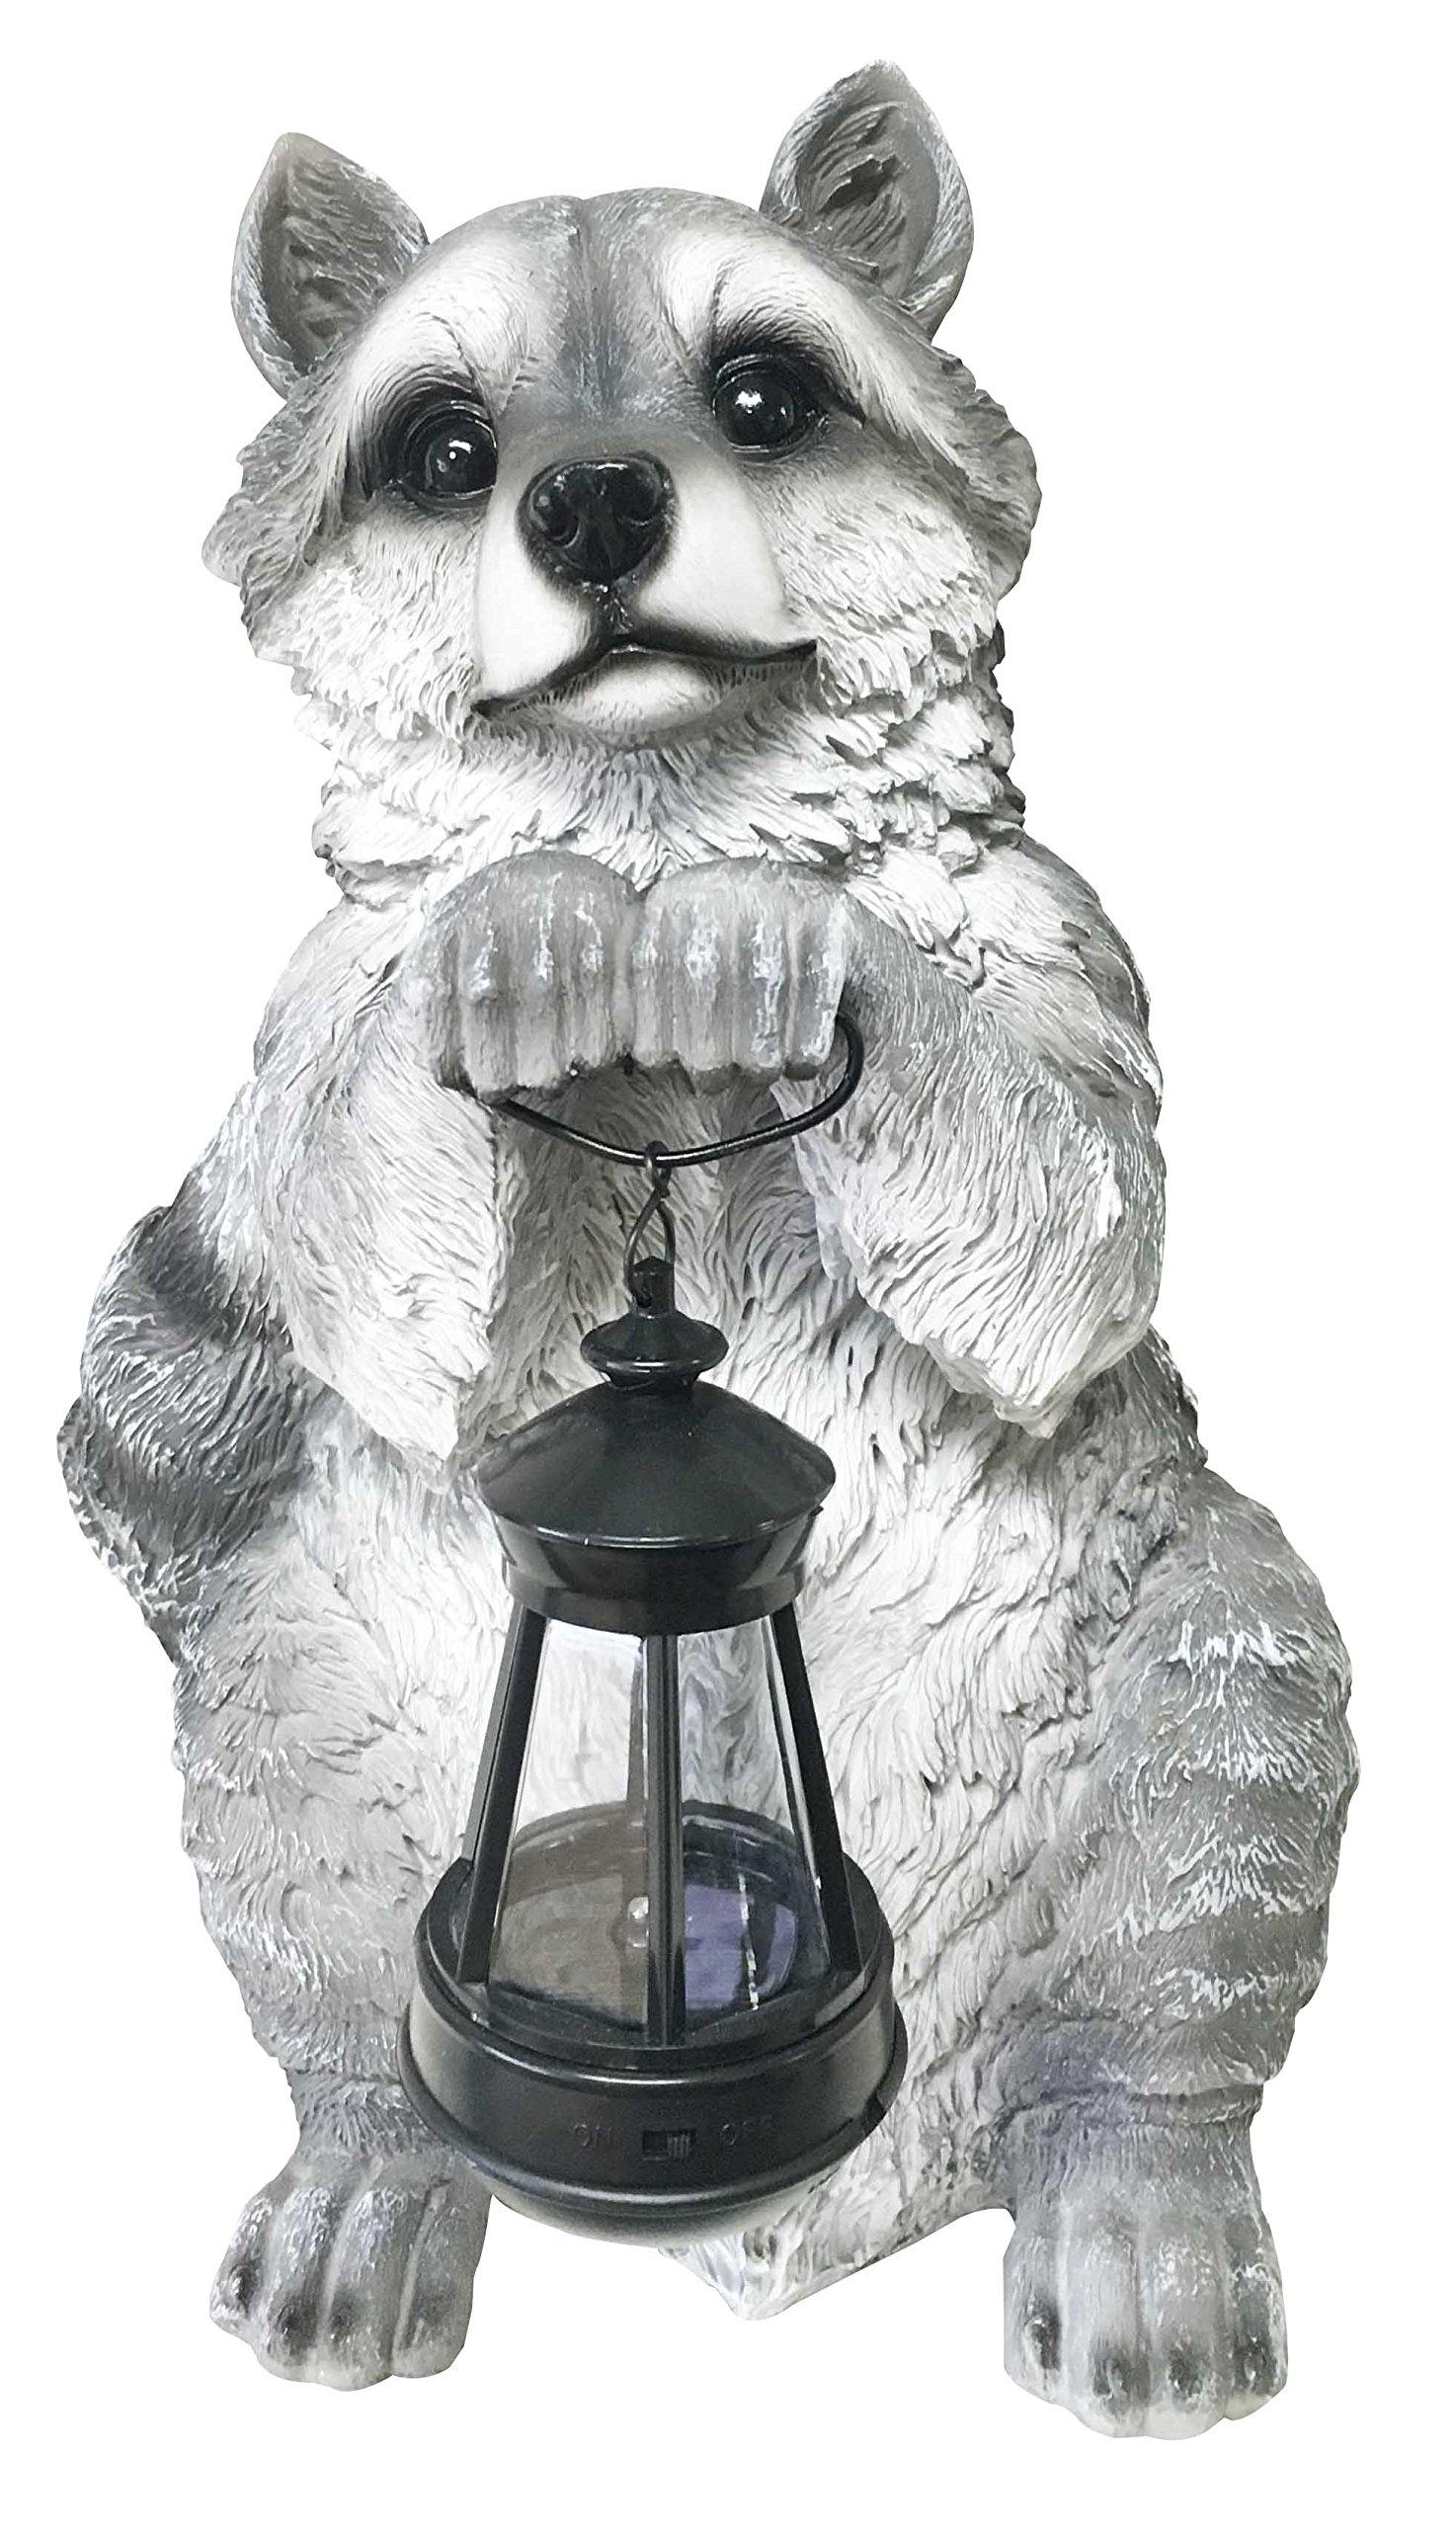 Ebros Night Bandit North American Raccoon Statue Holding Solar Powered Lantern LED Light Patio Decor Indoor Outdoor Raccoon